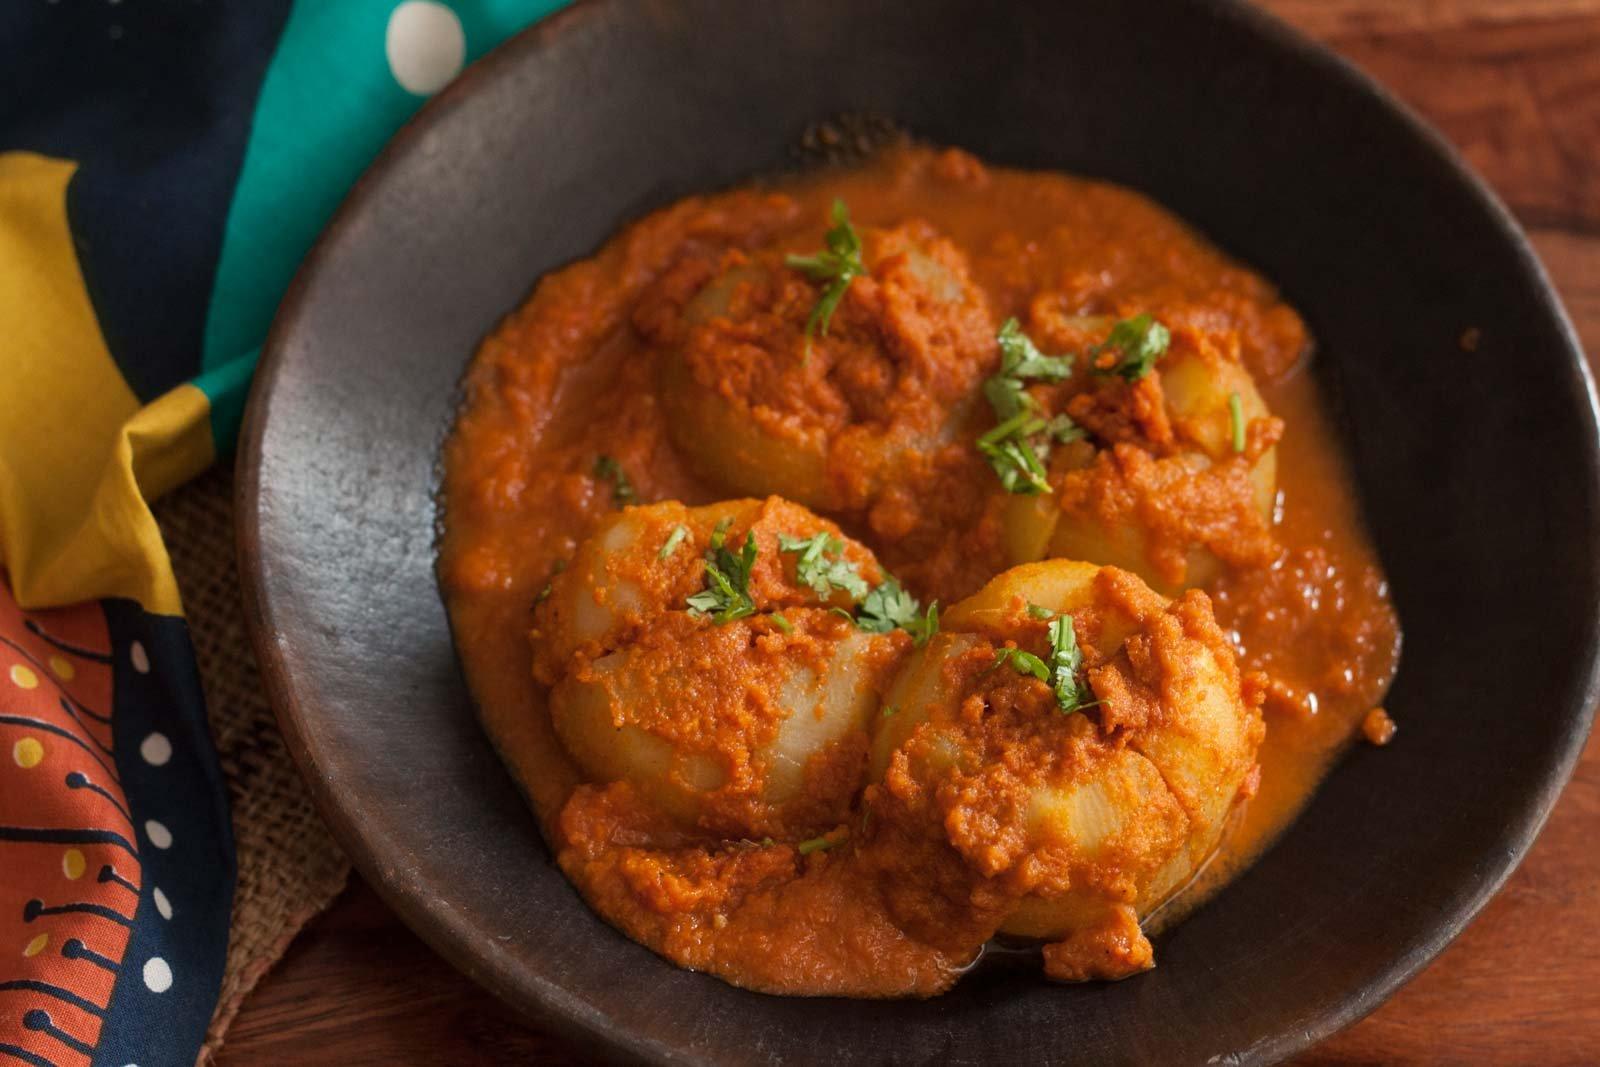 Receita Recheada de Bharwa Tinda (Cabaça de Maçã Recheada) da Archana's Kitchen